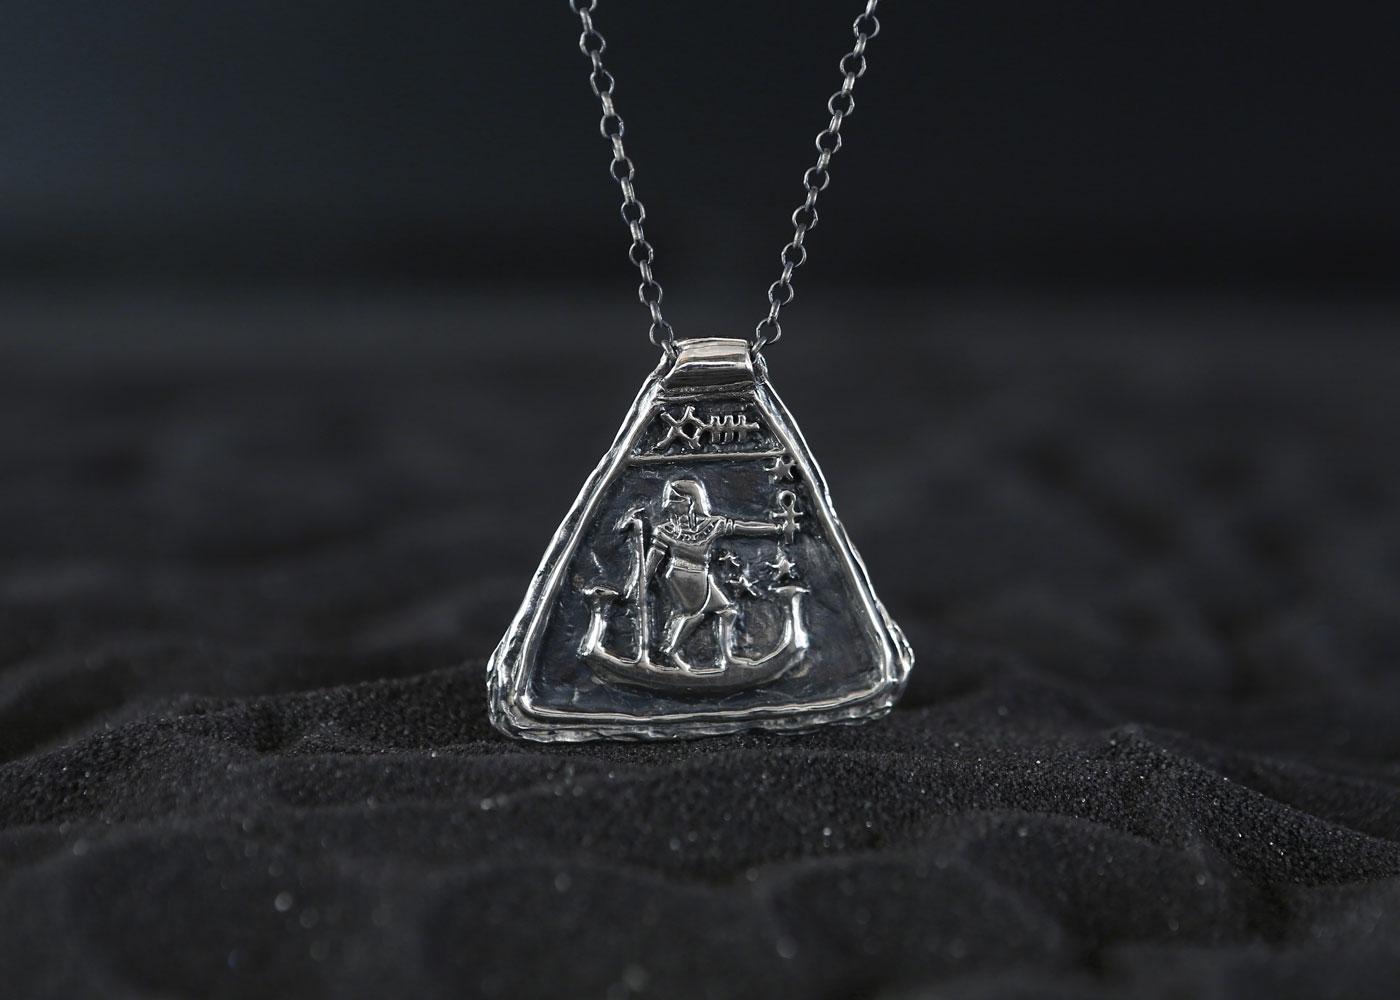 Telos Magic Sirius Amulet Silver Front View